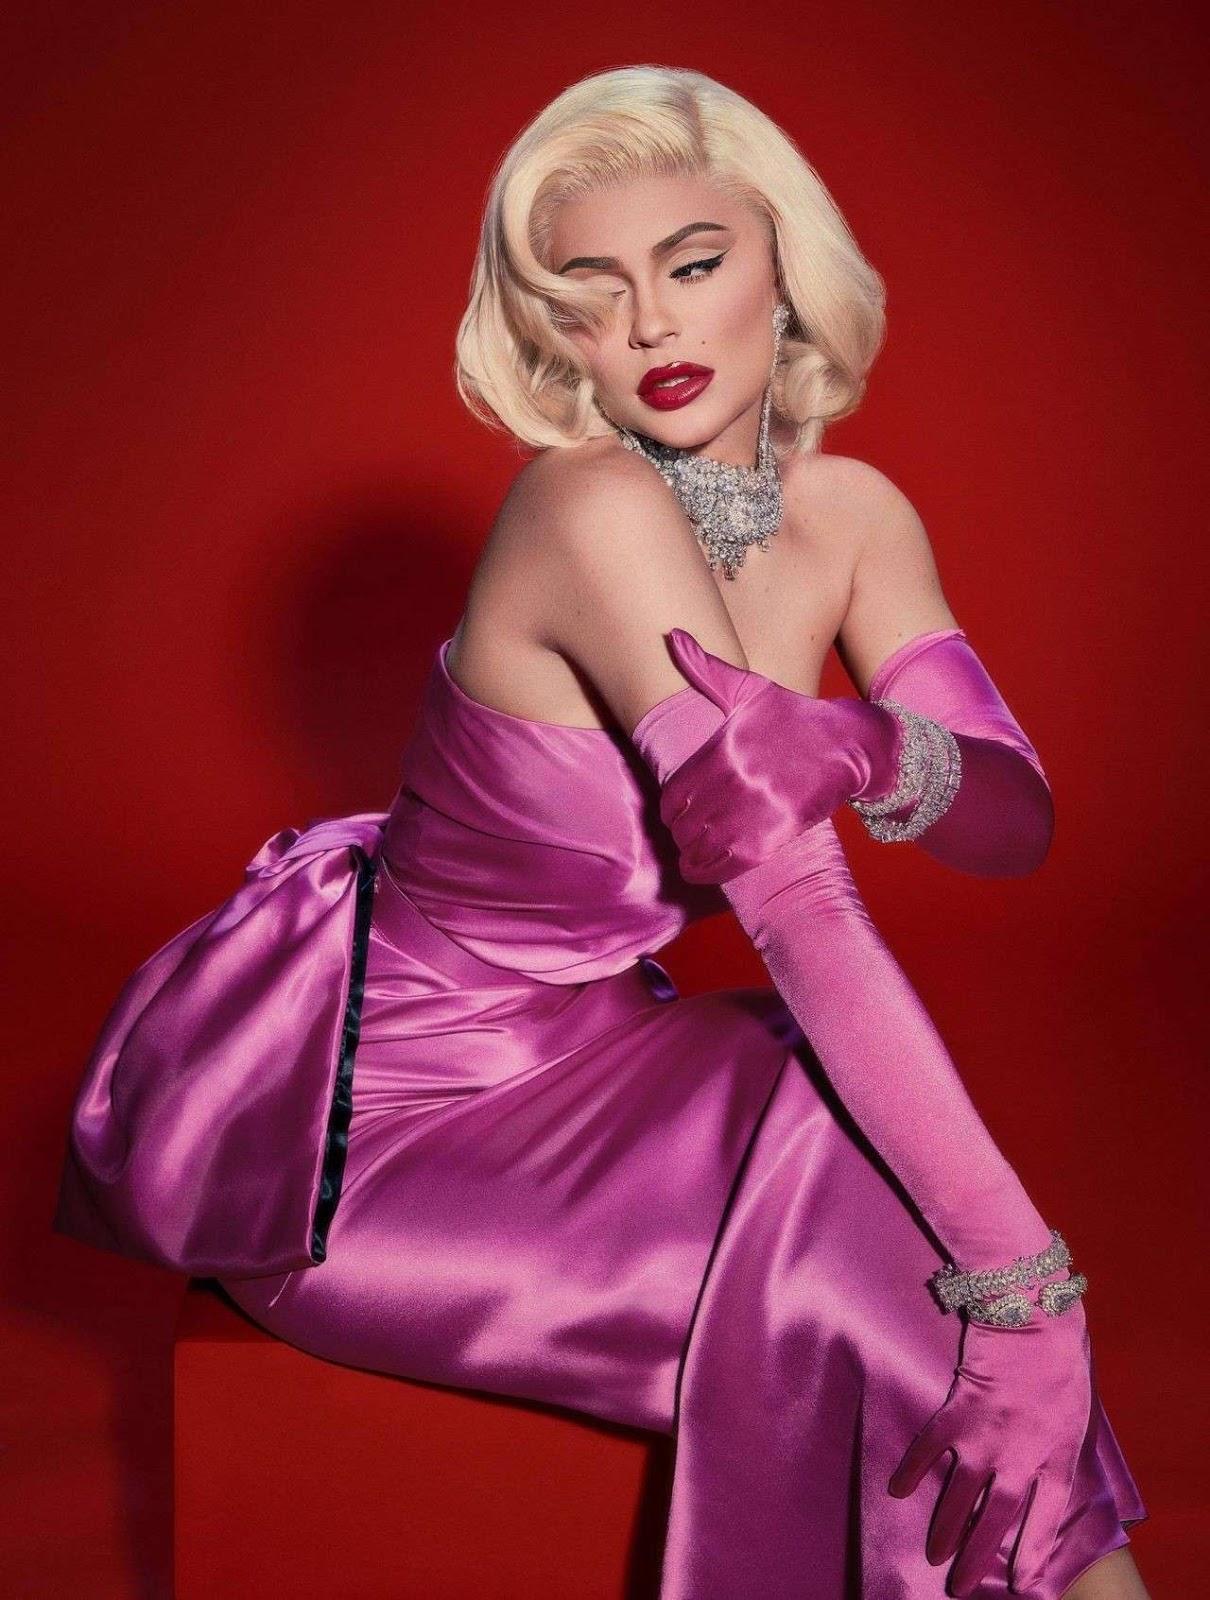 Kylie Jenner Marilyn Monroe Photoshoot